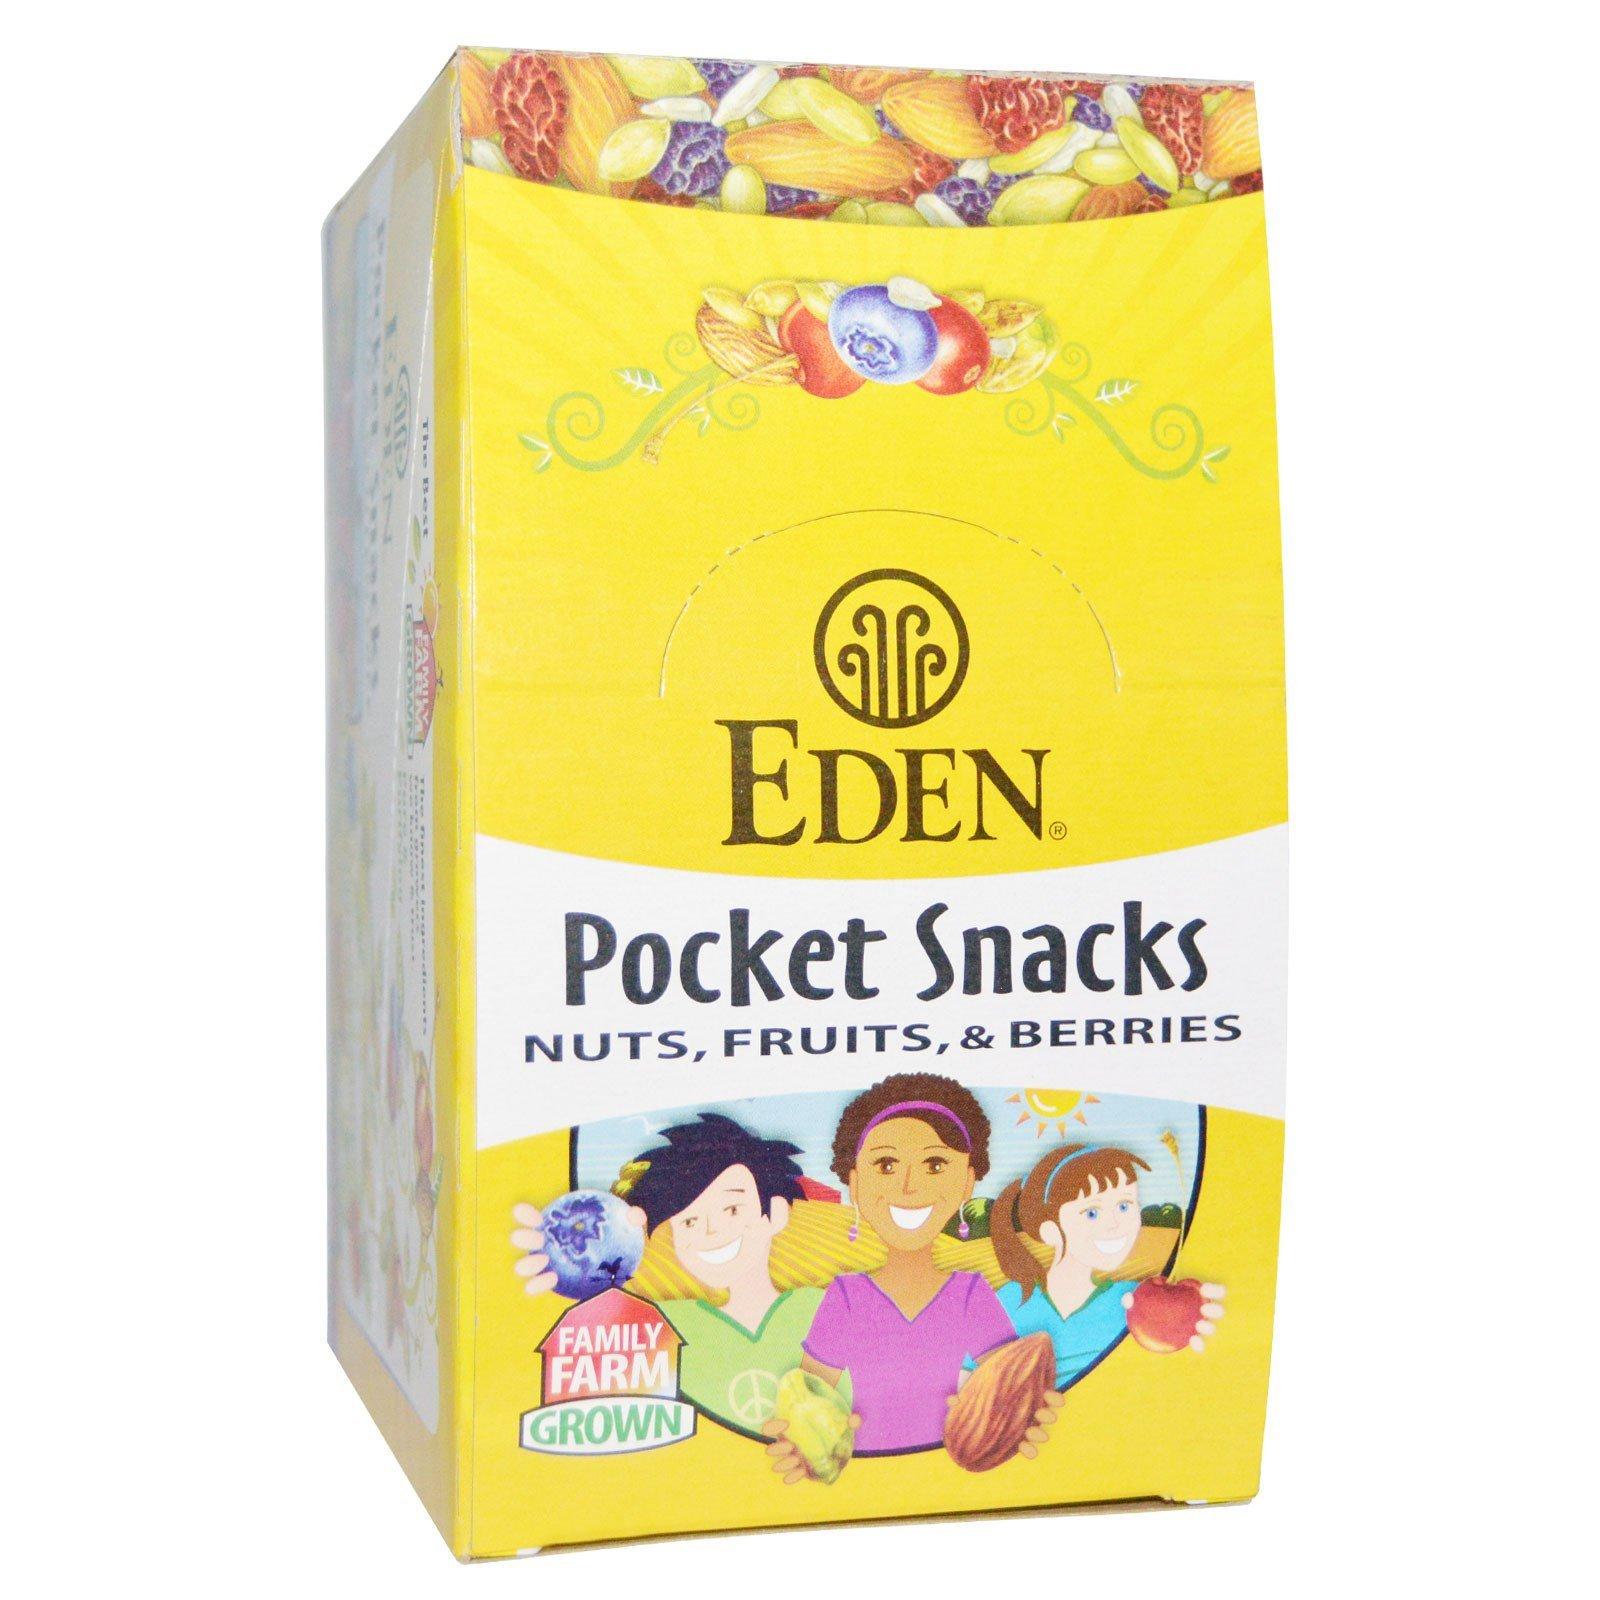 Eden Foods Organic Pocket Snacks Pumpkin Seeds Dry Roasted 12 Packages 1 oz 28 3 g Each